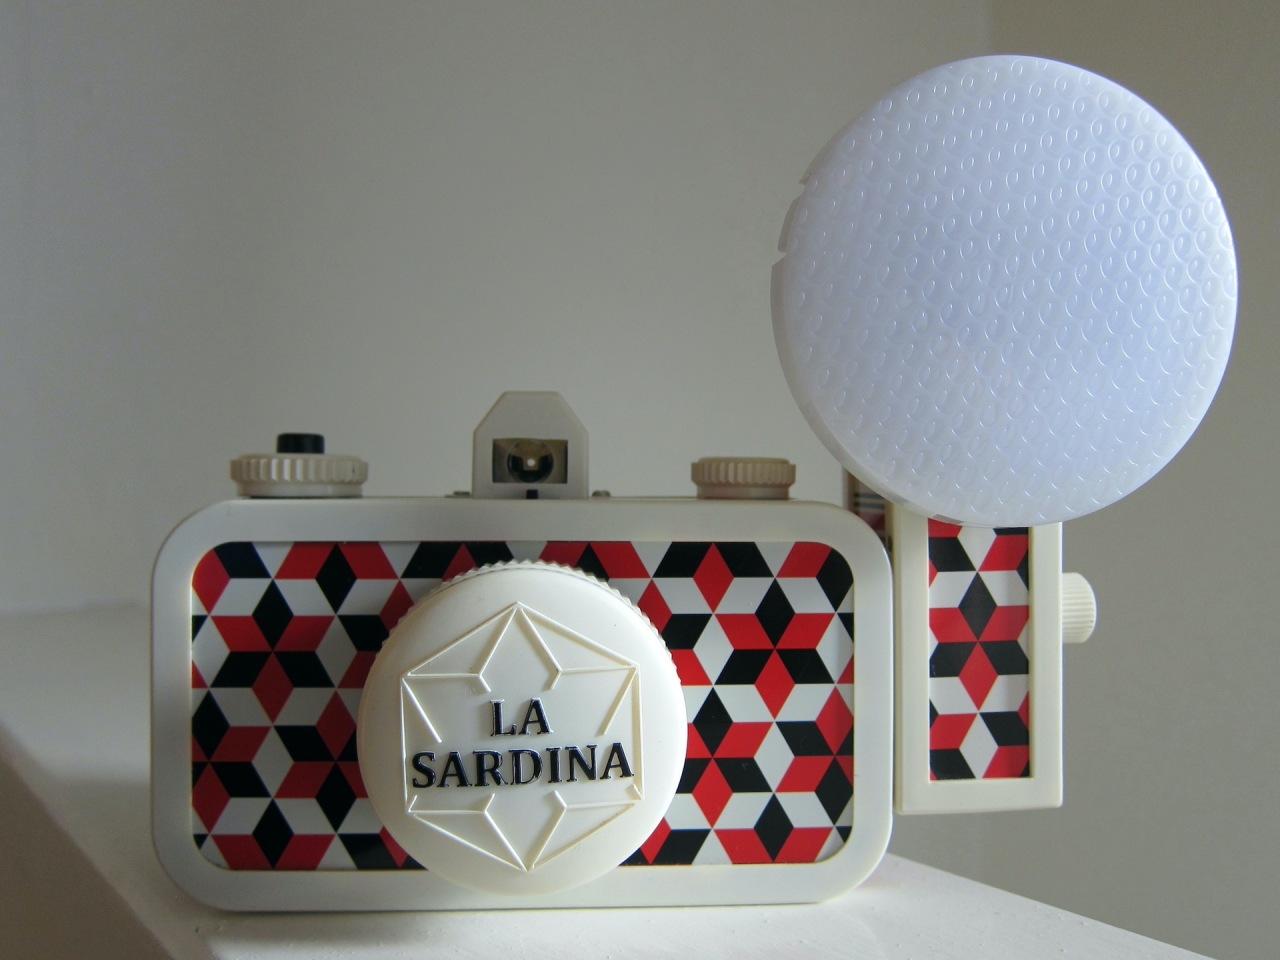 Lomography La Sardina